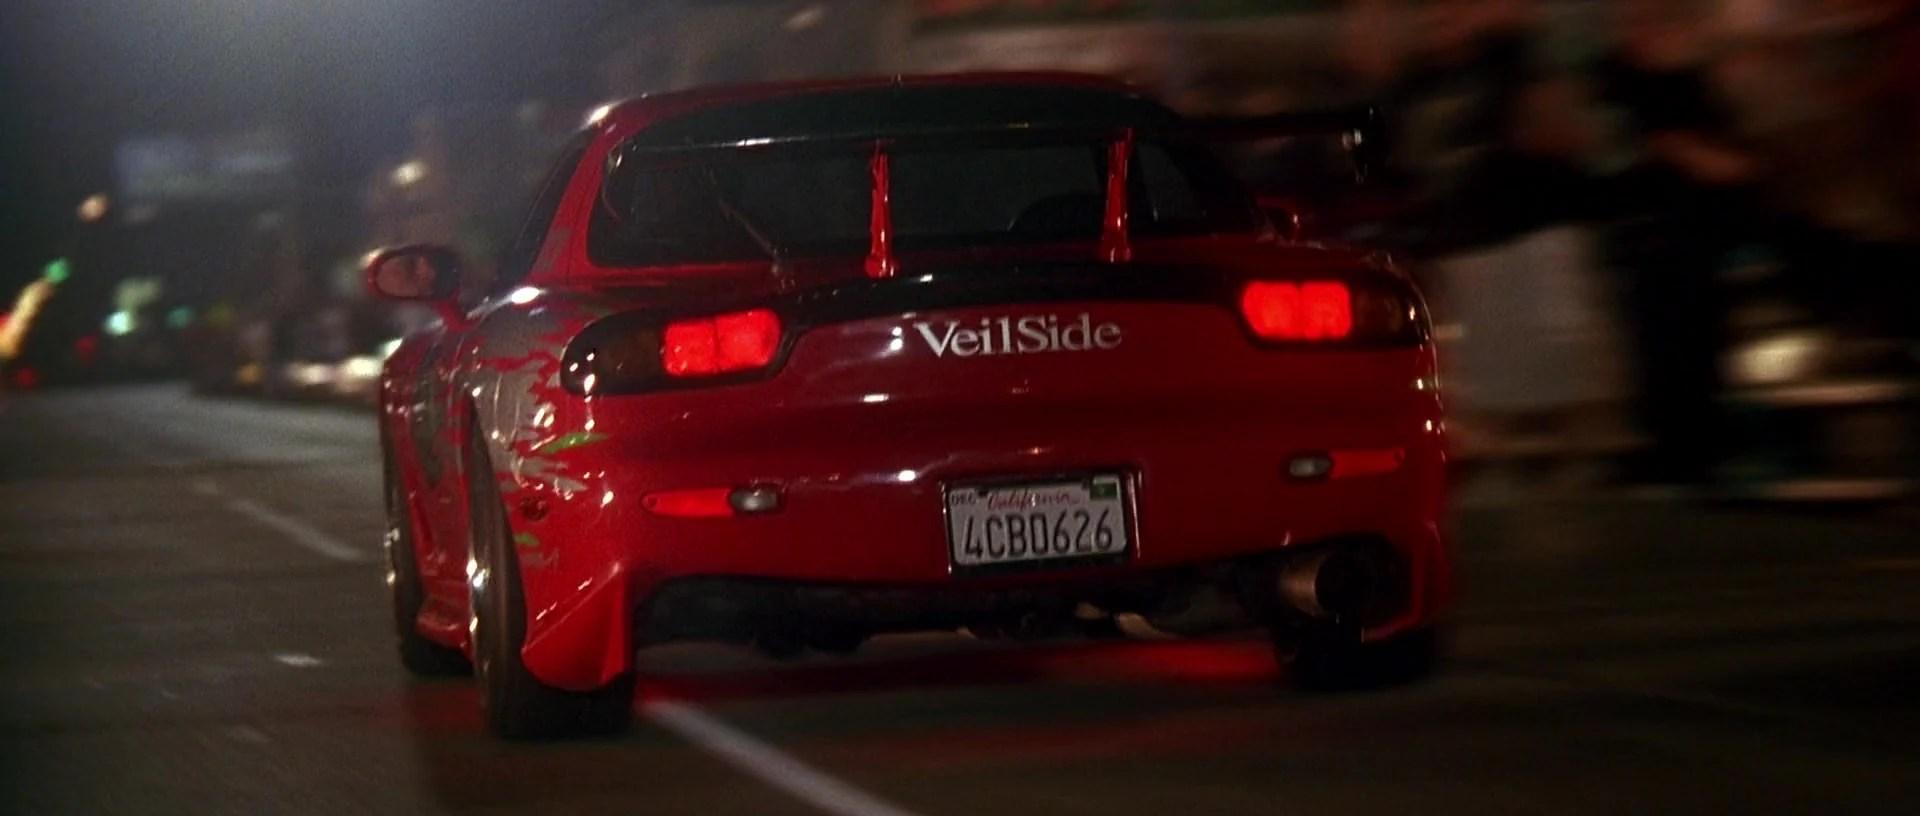 Drift Car Wallpaper Hd 1993 Mazda Rx 7 The Fast And The Furious Wiki Fandom